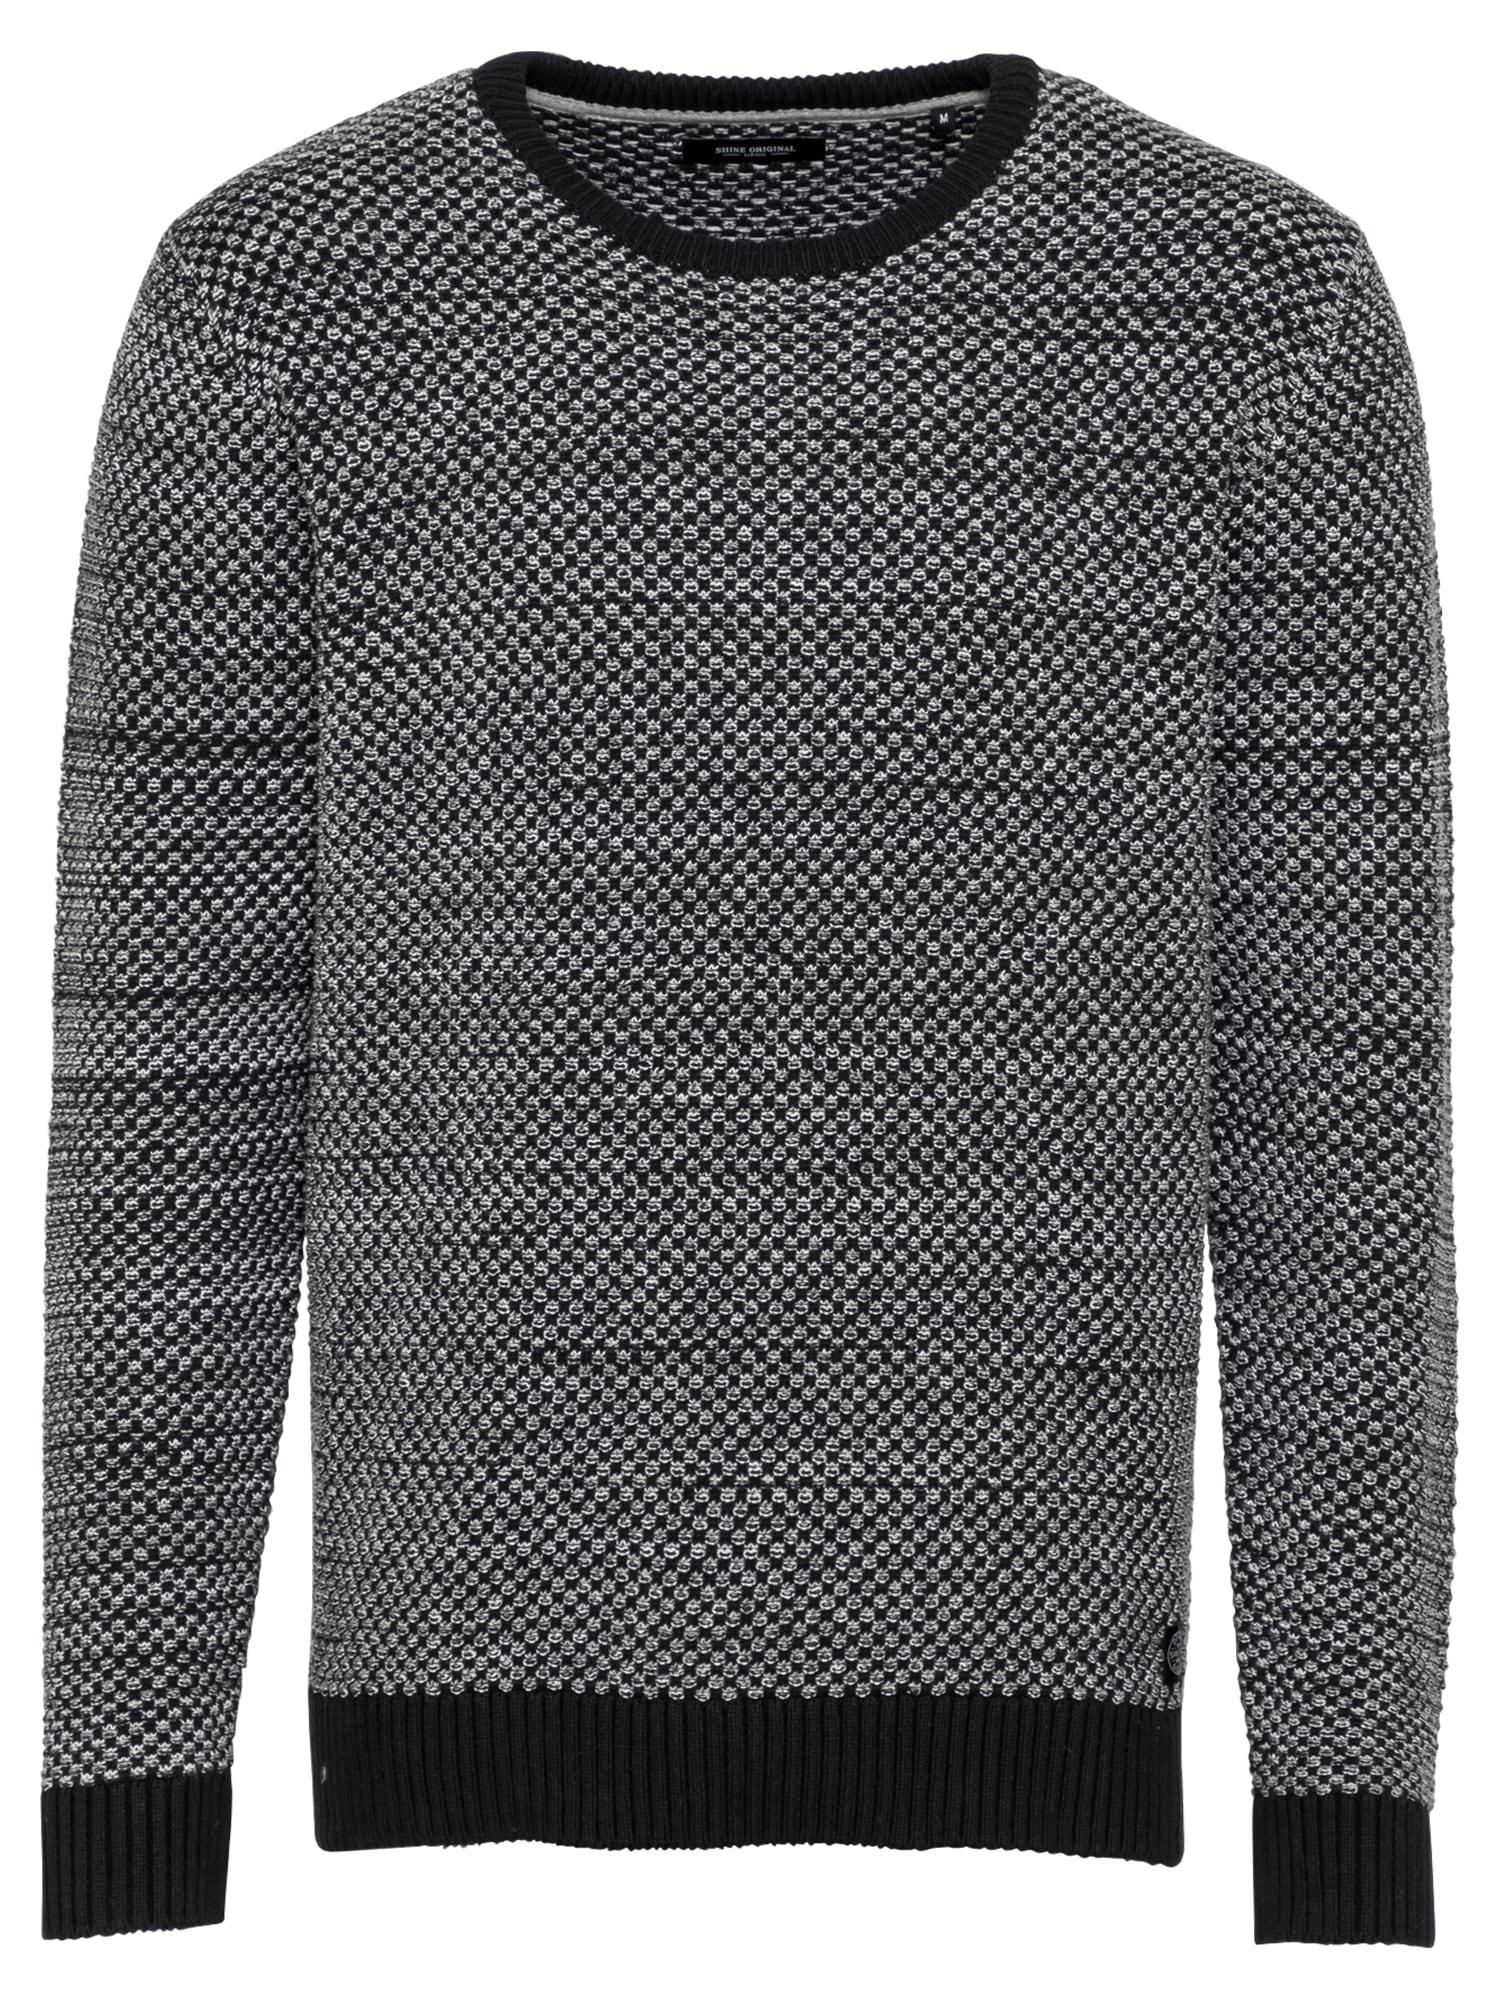 SHINE ORIGINAL Megztinis margai juoda / balta